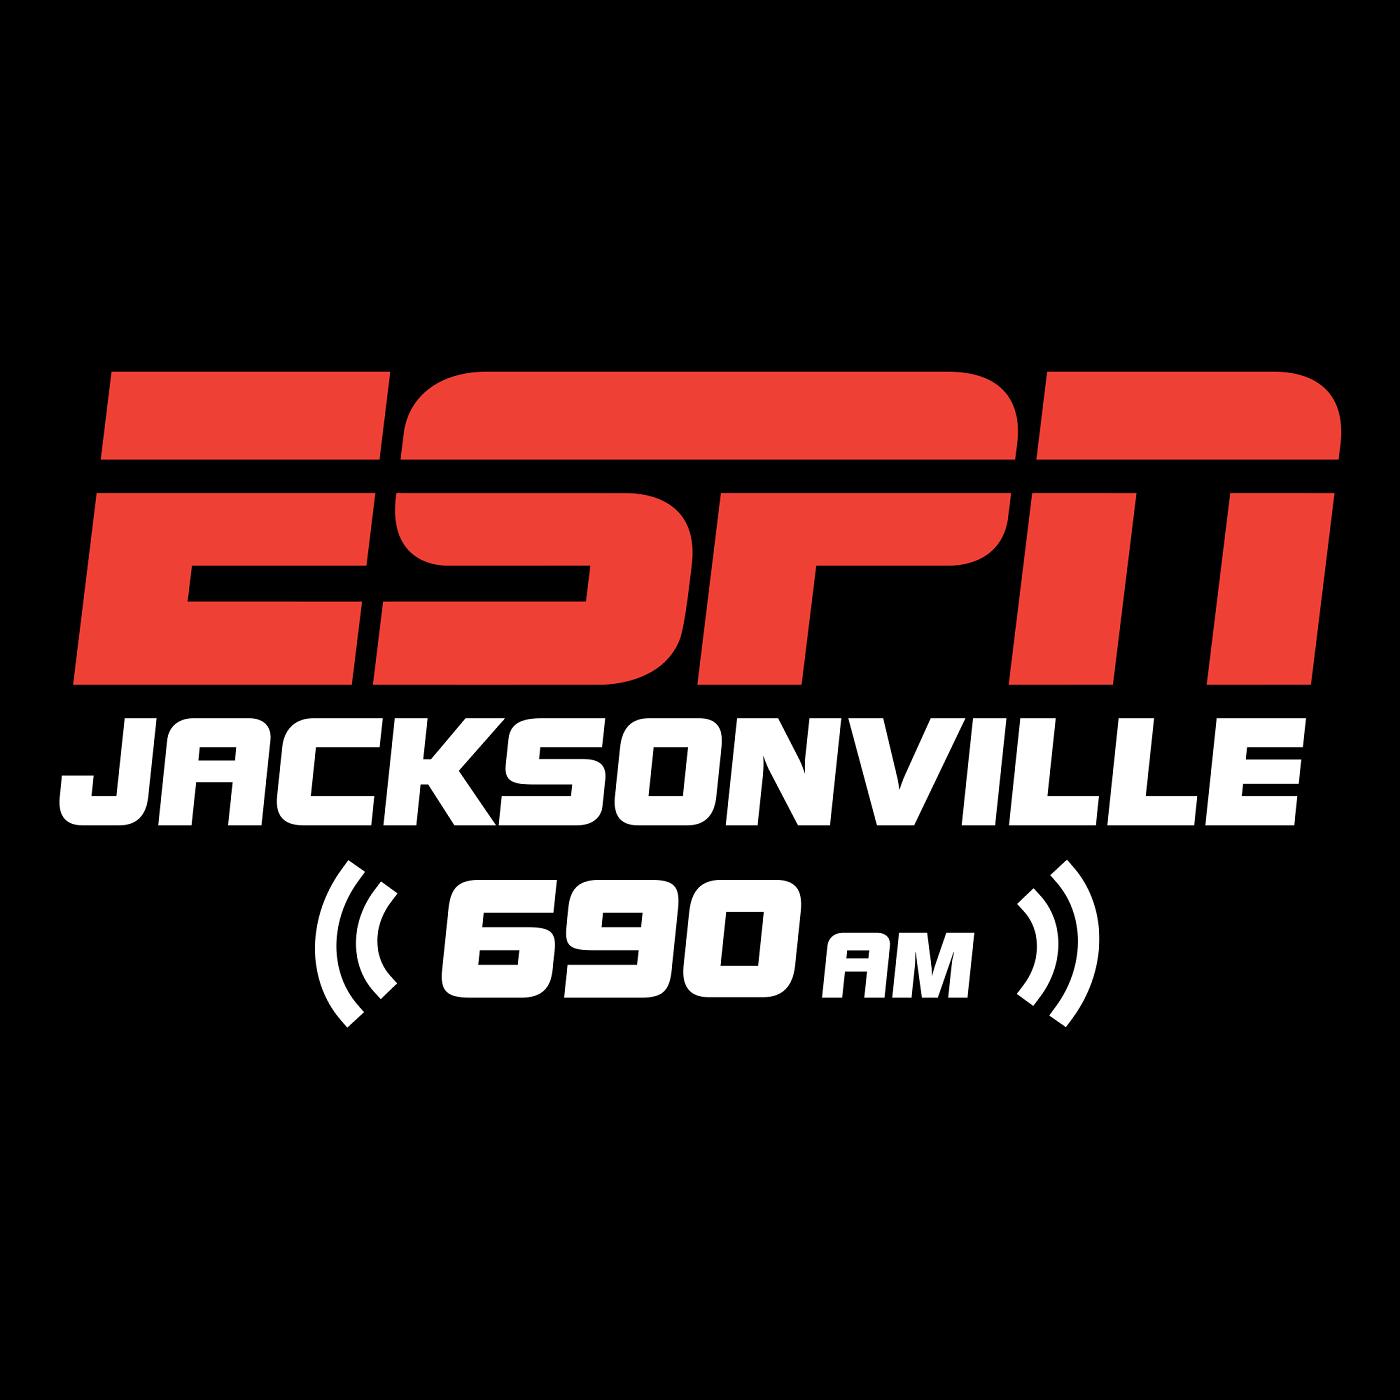 Espn 690 Jacksonville S Home For Espn Radio Listen Live Radio Com